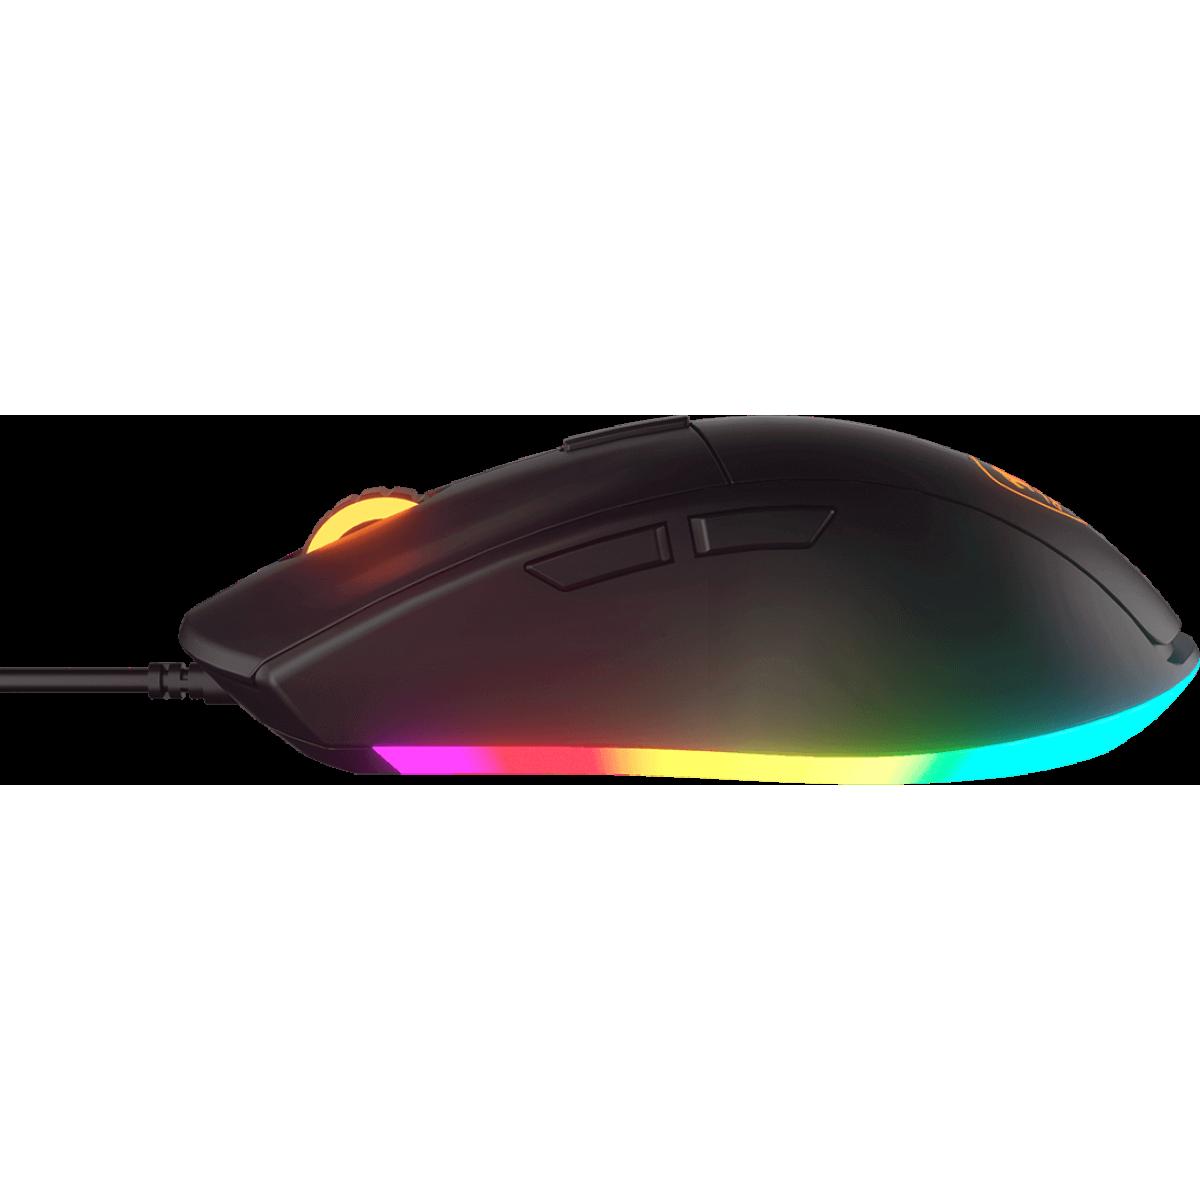 Mouse Gamer Cougar Minos XT, 6 Botões Programáveis, 3200 DPI, RGB, Preto, CGR-MINOS XT